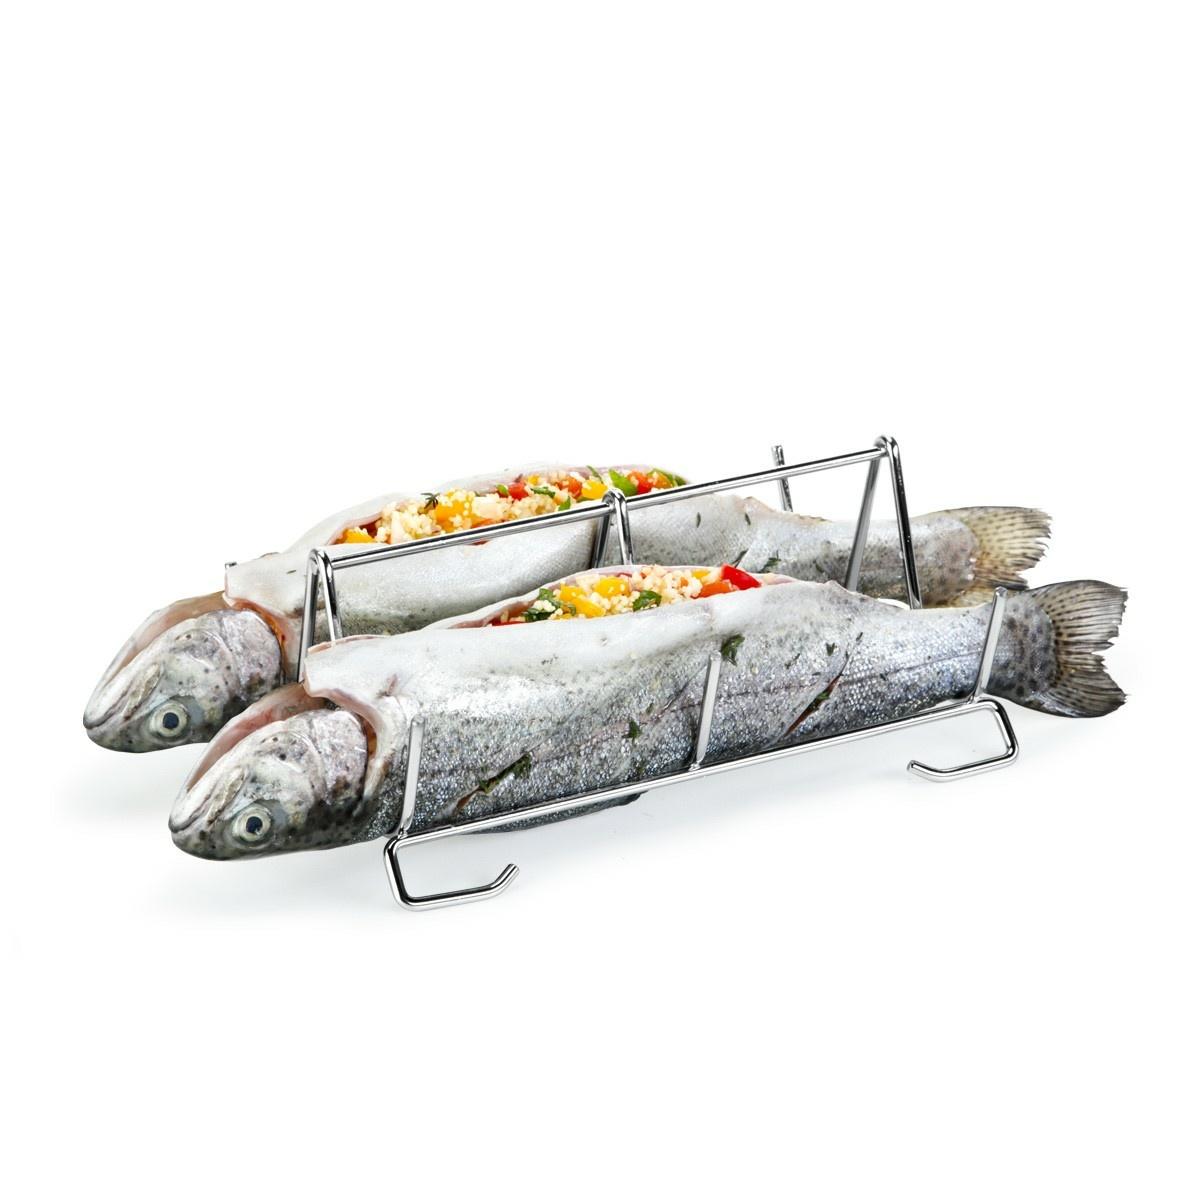 Tescoma Stojan na ryby GrandCHEF